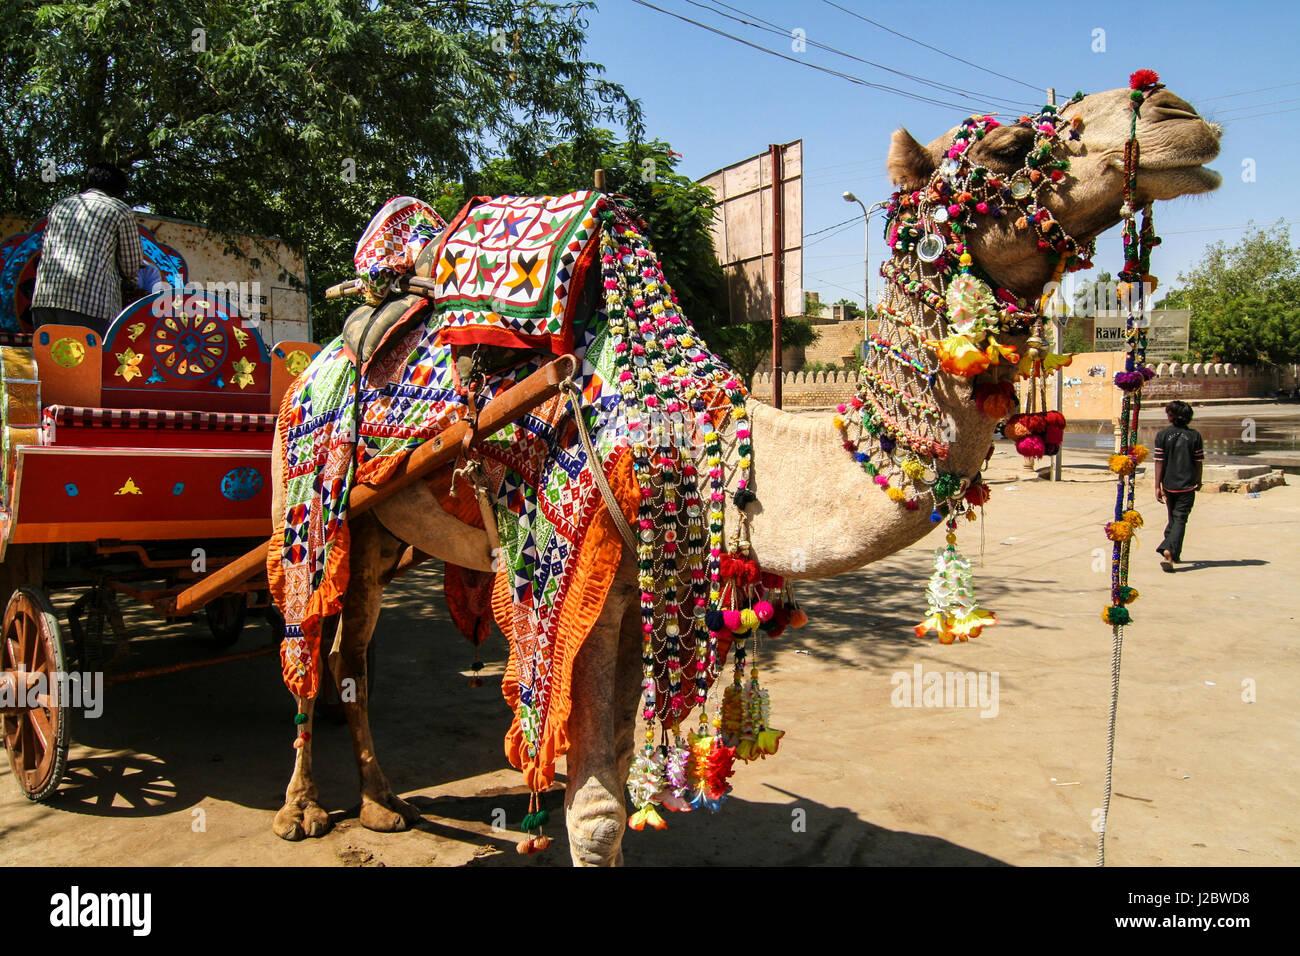 Jaisalmer, Rajasthan, India. Decorated camel - Stock Image